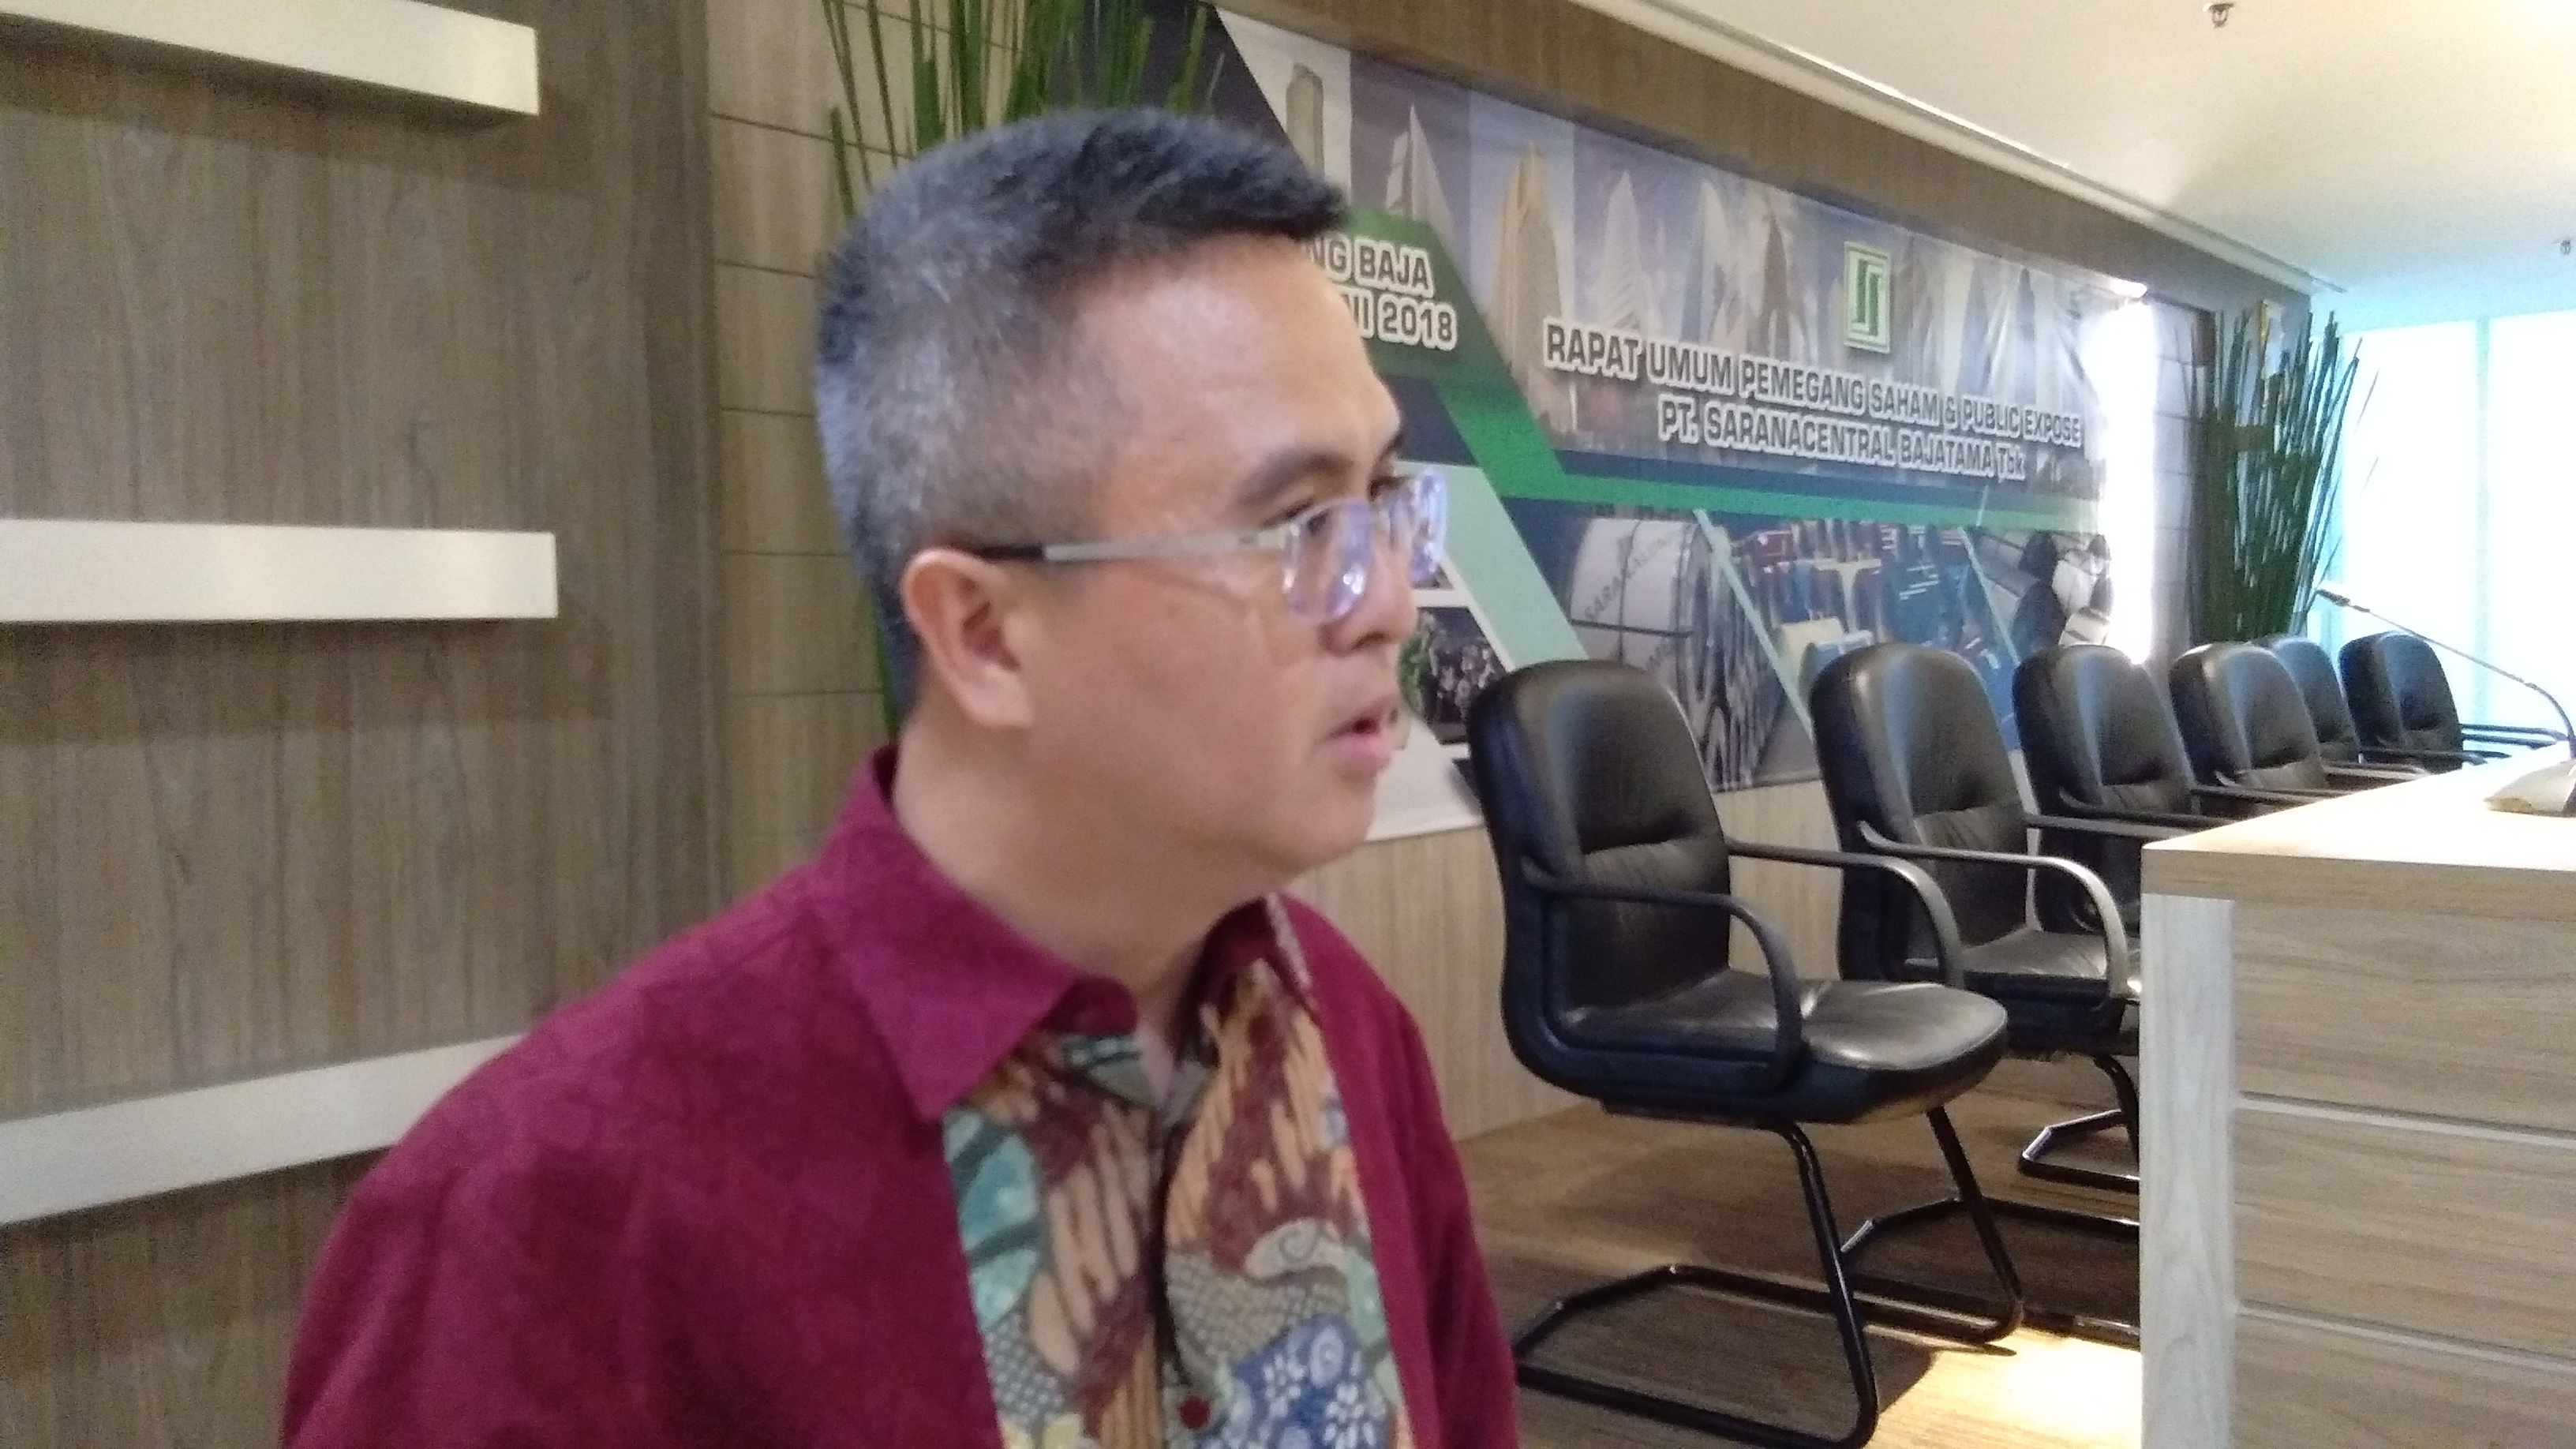 BAJA Harga Saham BAJA Melesat - Respon Pasar dari Pembatasan Impor Baja   Neraca.co.id